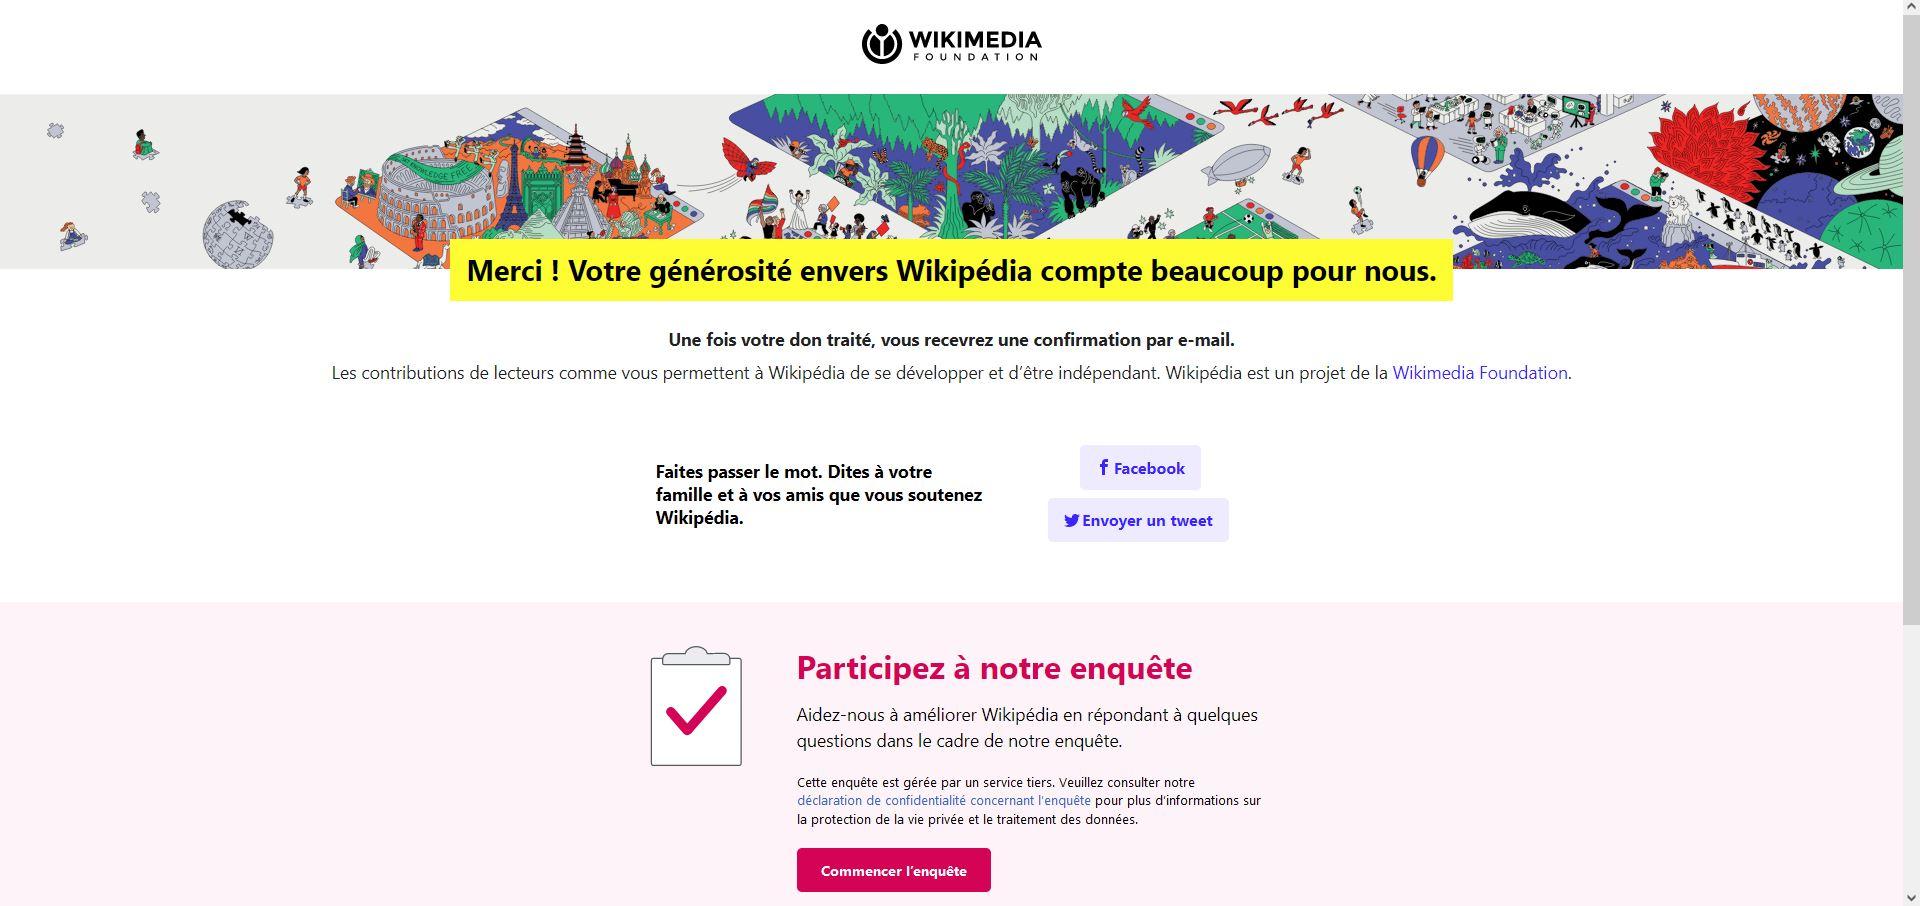 Soutien financier à Wikipedia [Le village de TSGE] Tsge2434